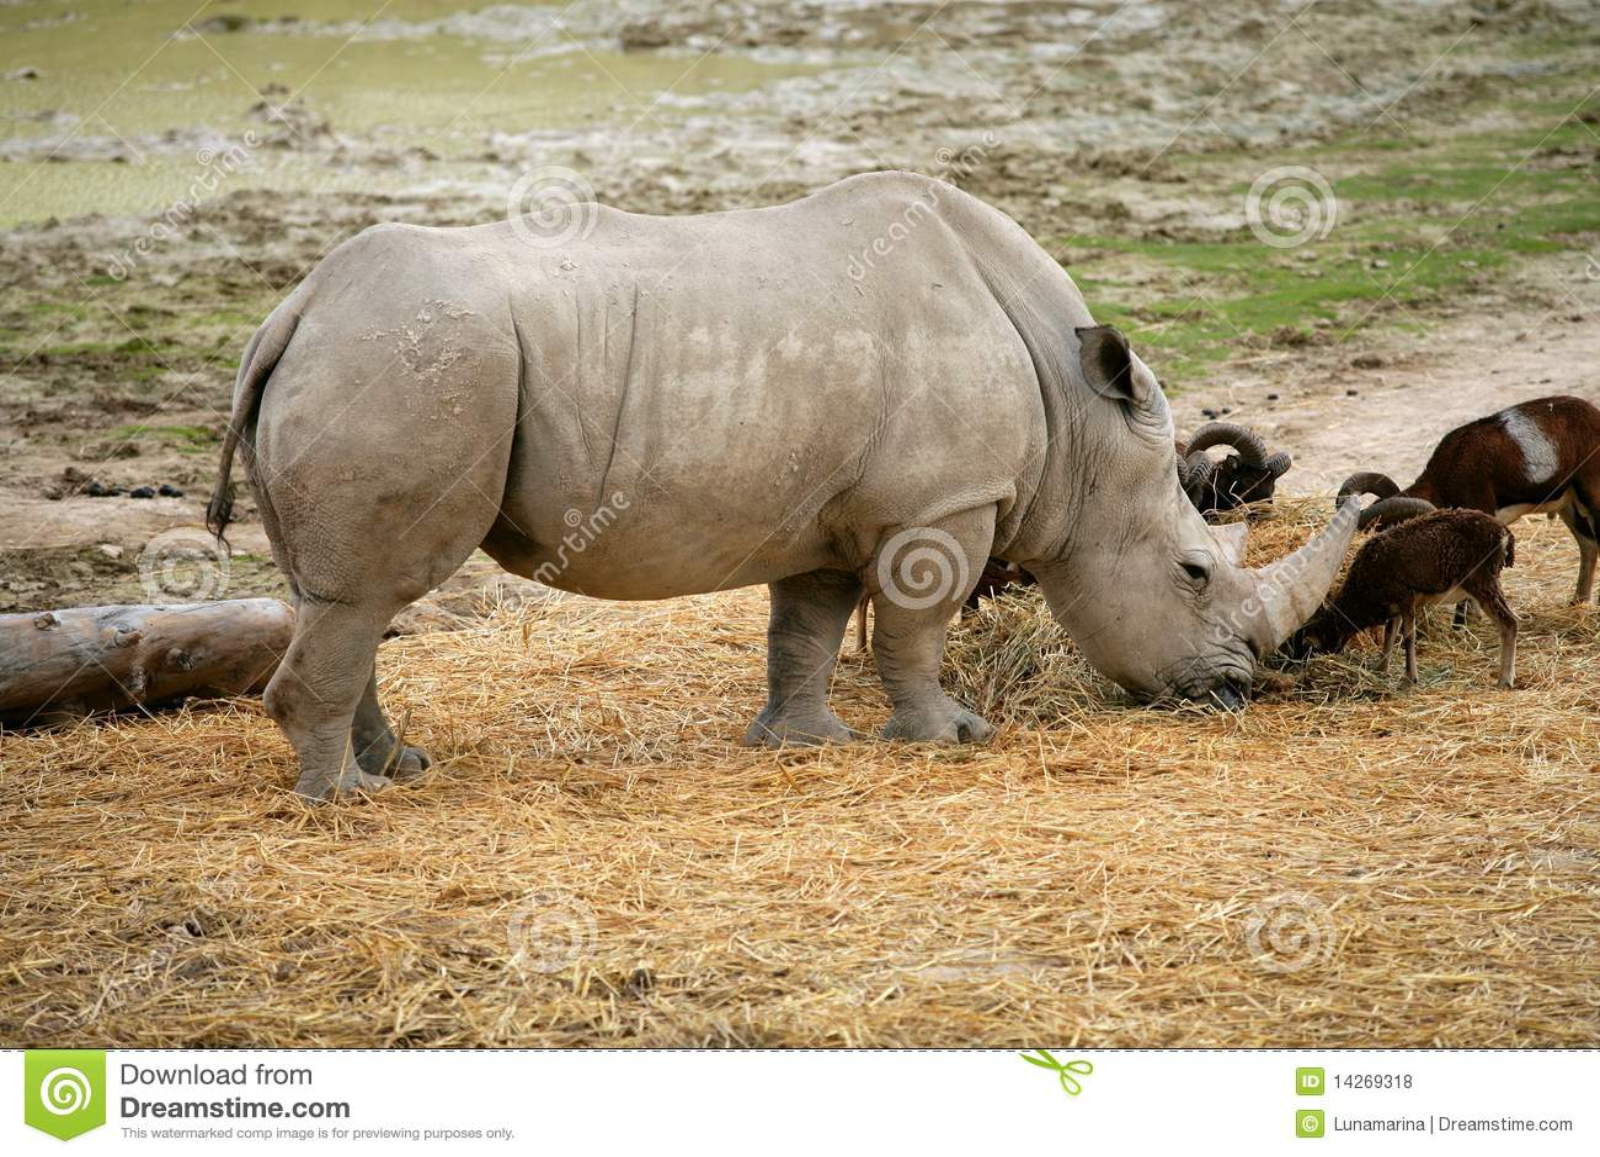 Rhino eating african rhinoceros stand up